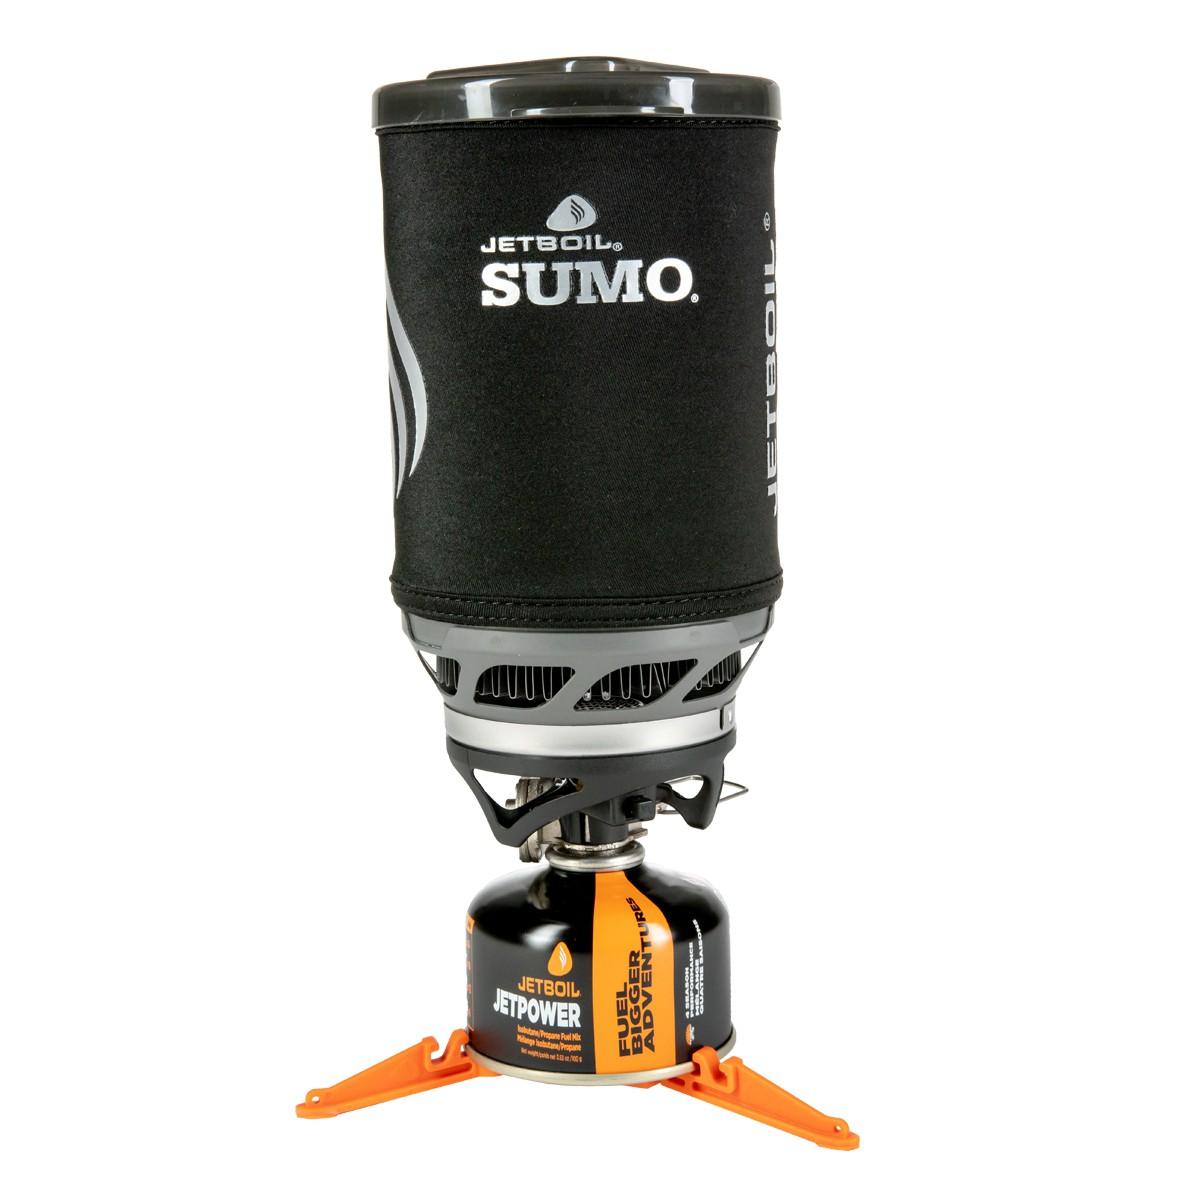 Jetboil Sumo